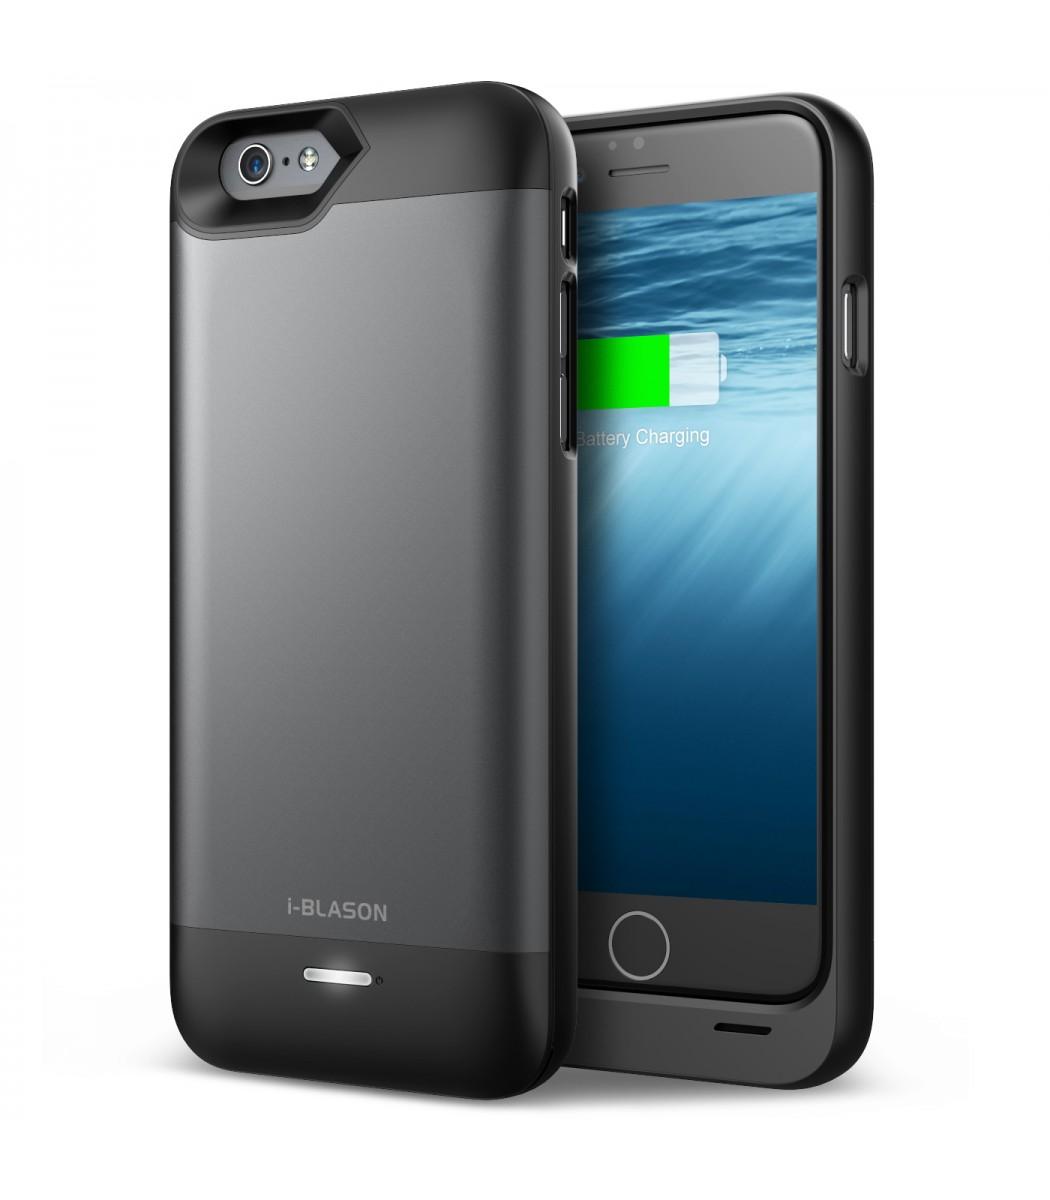 i-Blason-iphone-6-black-unitypower-rechargeable-external-battery-case-31